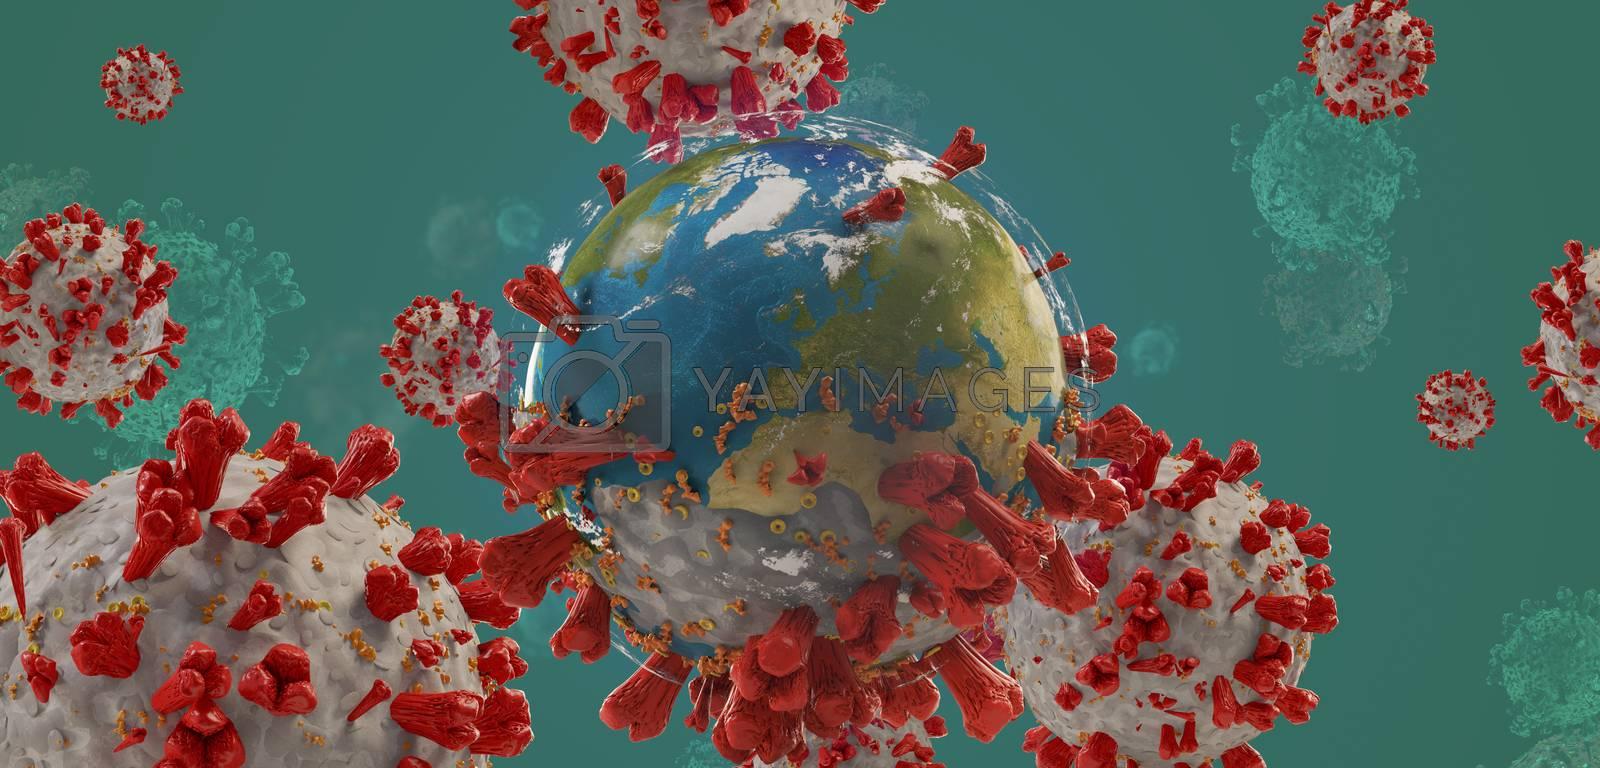 global virus COVID-19 Coronavirus symbolic detailed design background 3d-illustration. elements of this image furnished by NASA